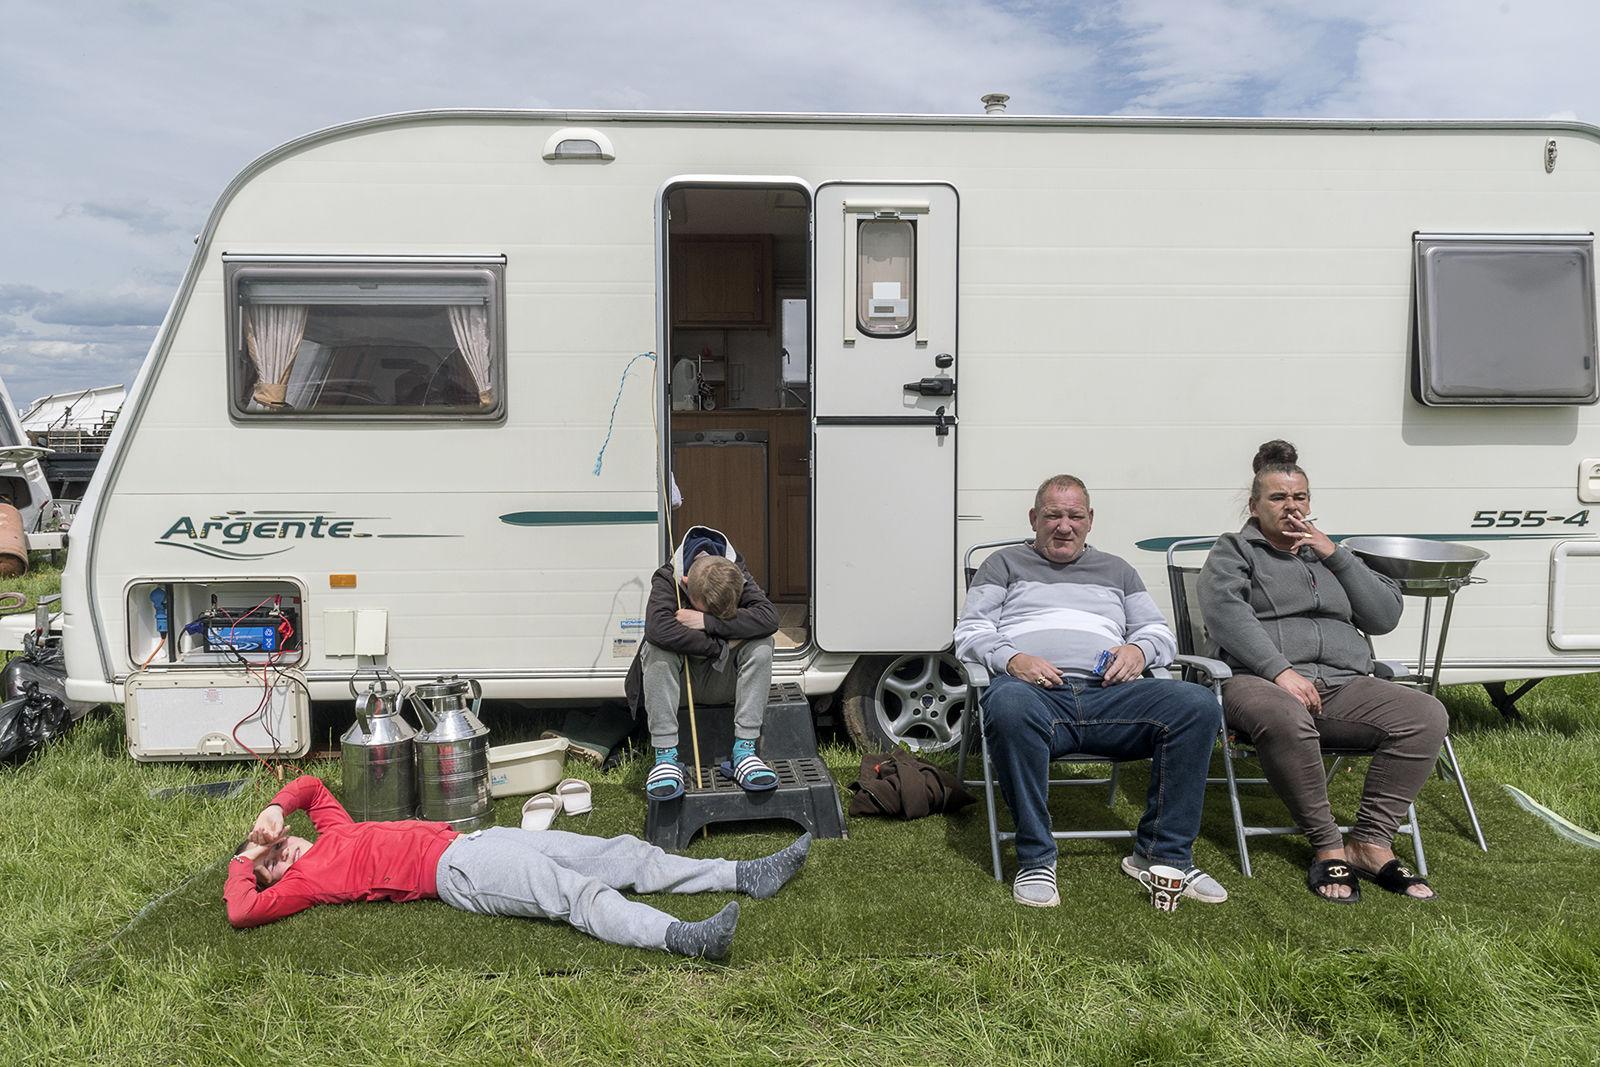 Family on Artificial Grass, Appleby Horse Fair, UK 2019